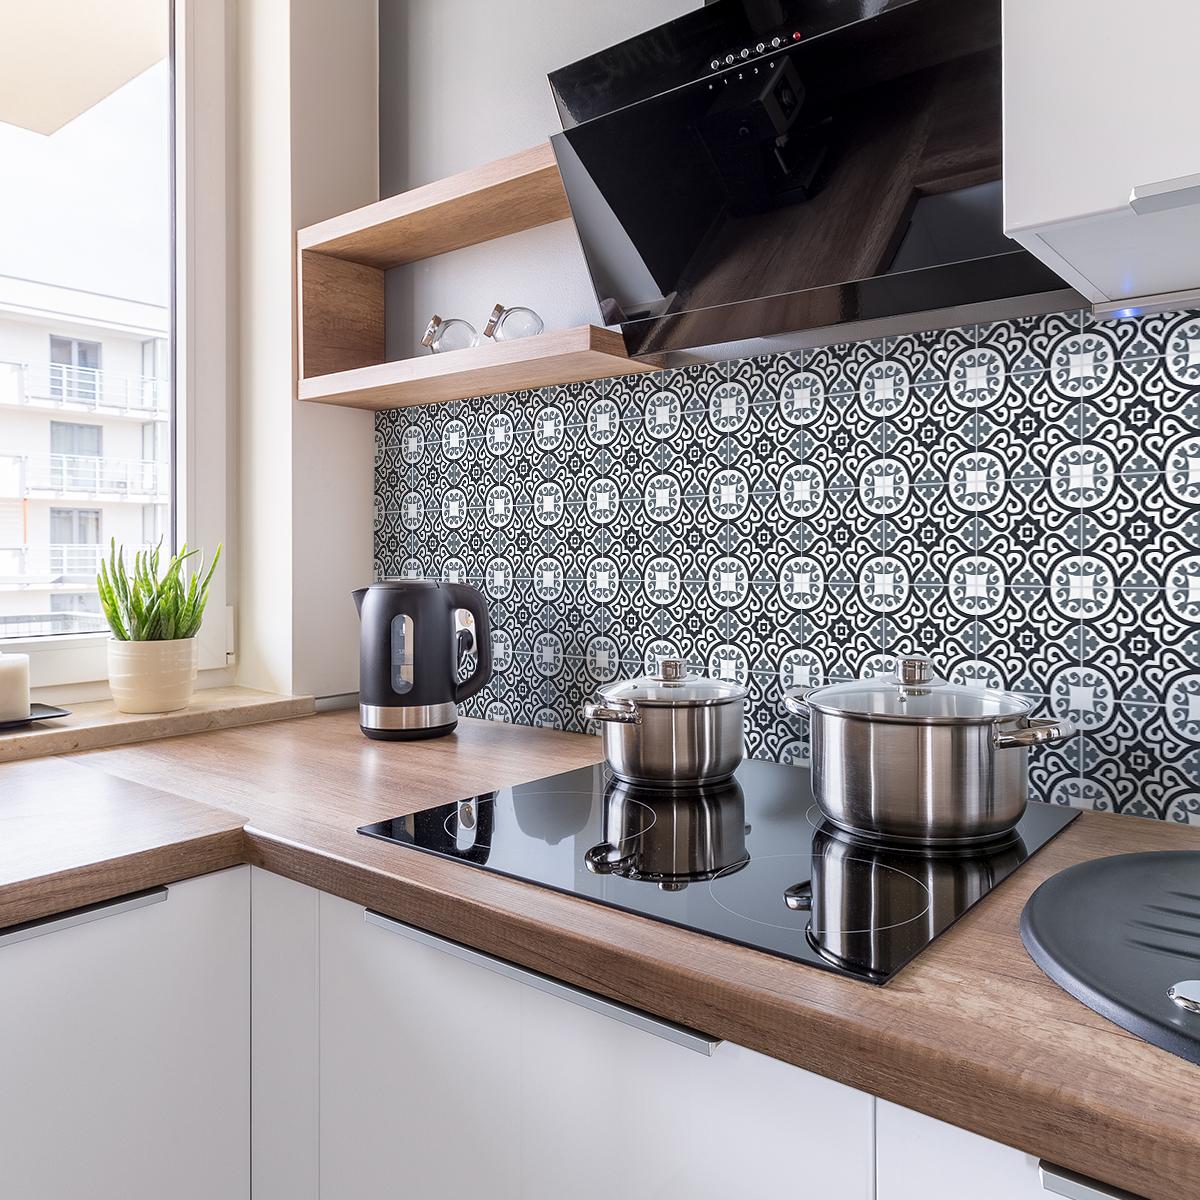 30 stickers carreaux de ciment azulejos inda cuisine carrelages ambiance sticker. Black Bedroom Furniture Sets. Home Design Ideas